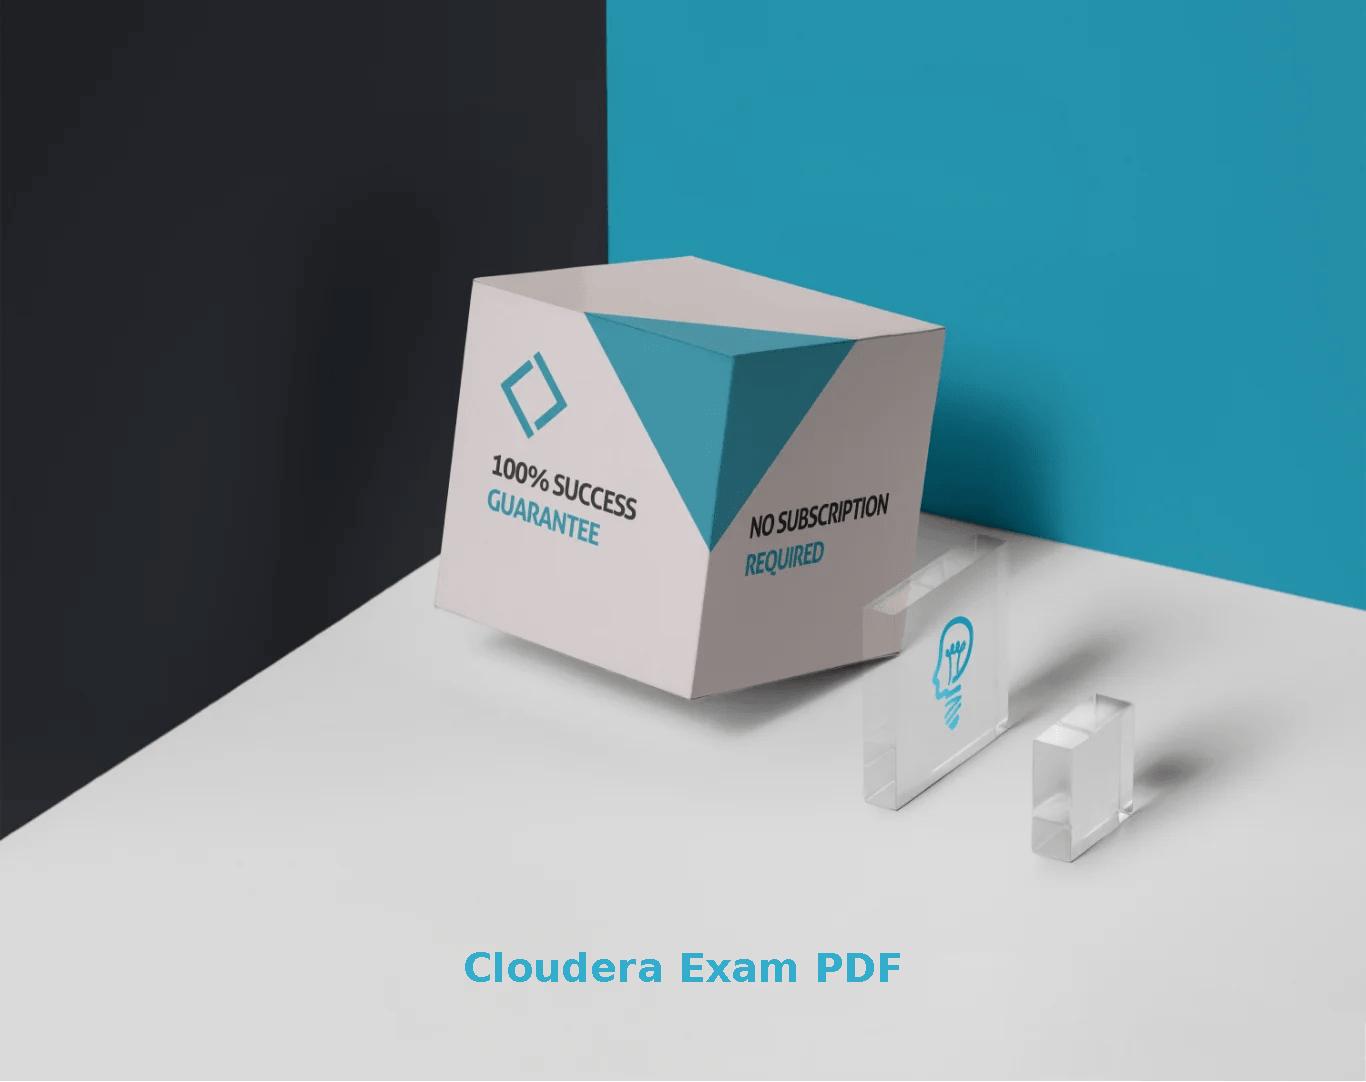 Cloudera Exam PDF